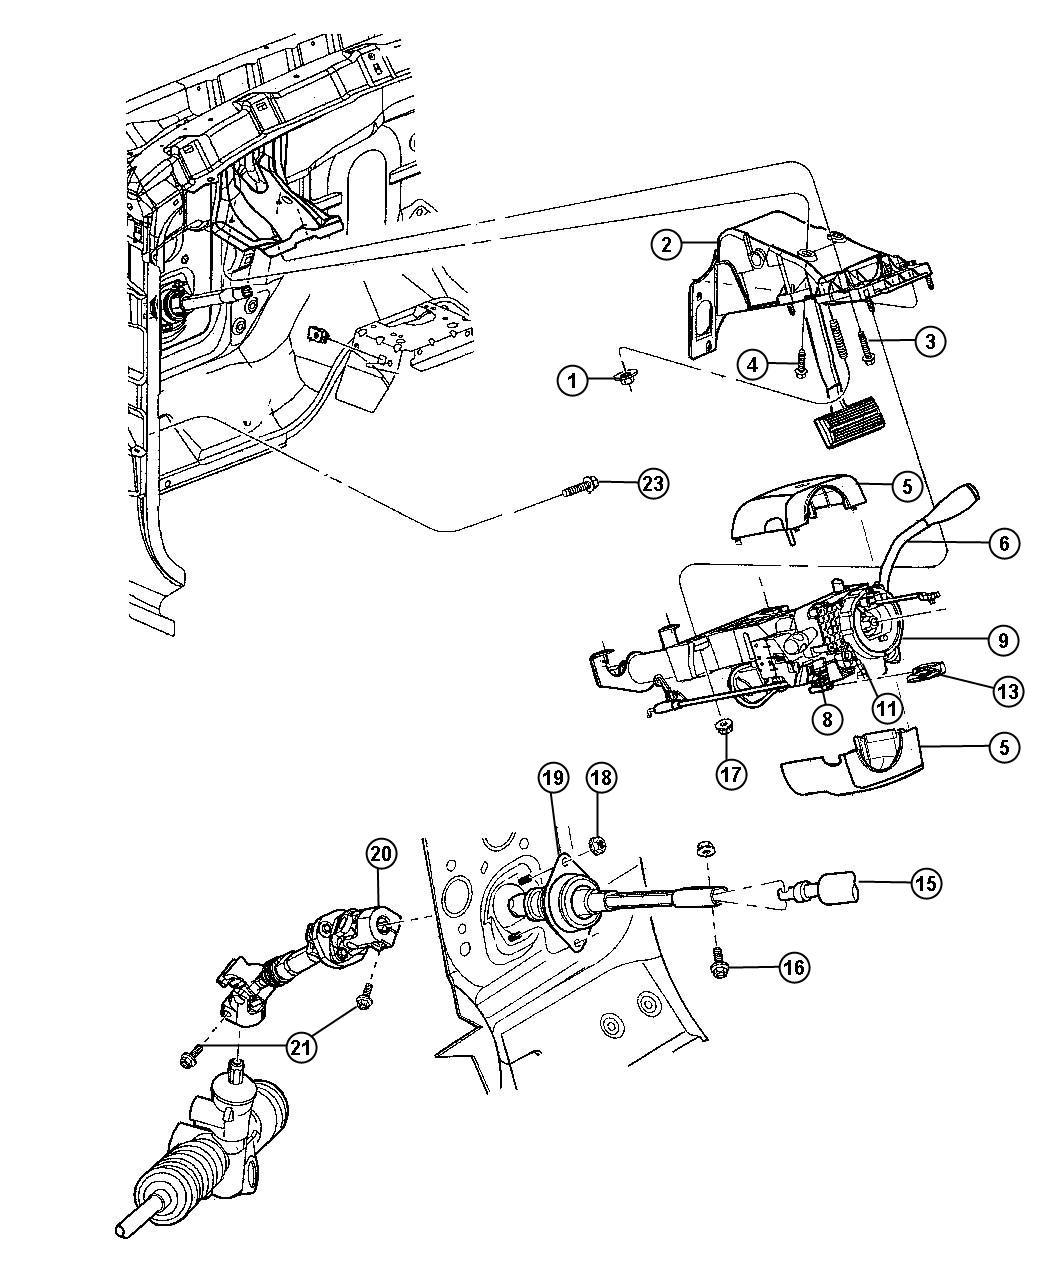 2008 Dodge Ram 1500 Knob. Tilt lever release. [tilt